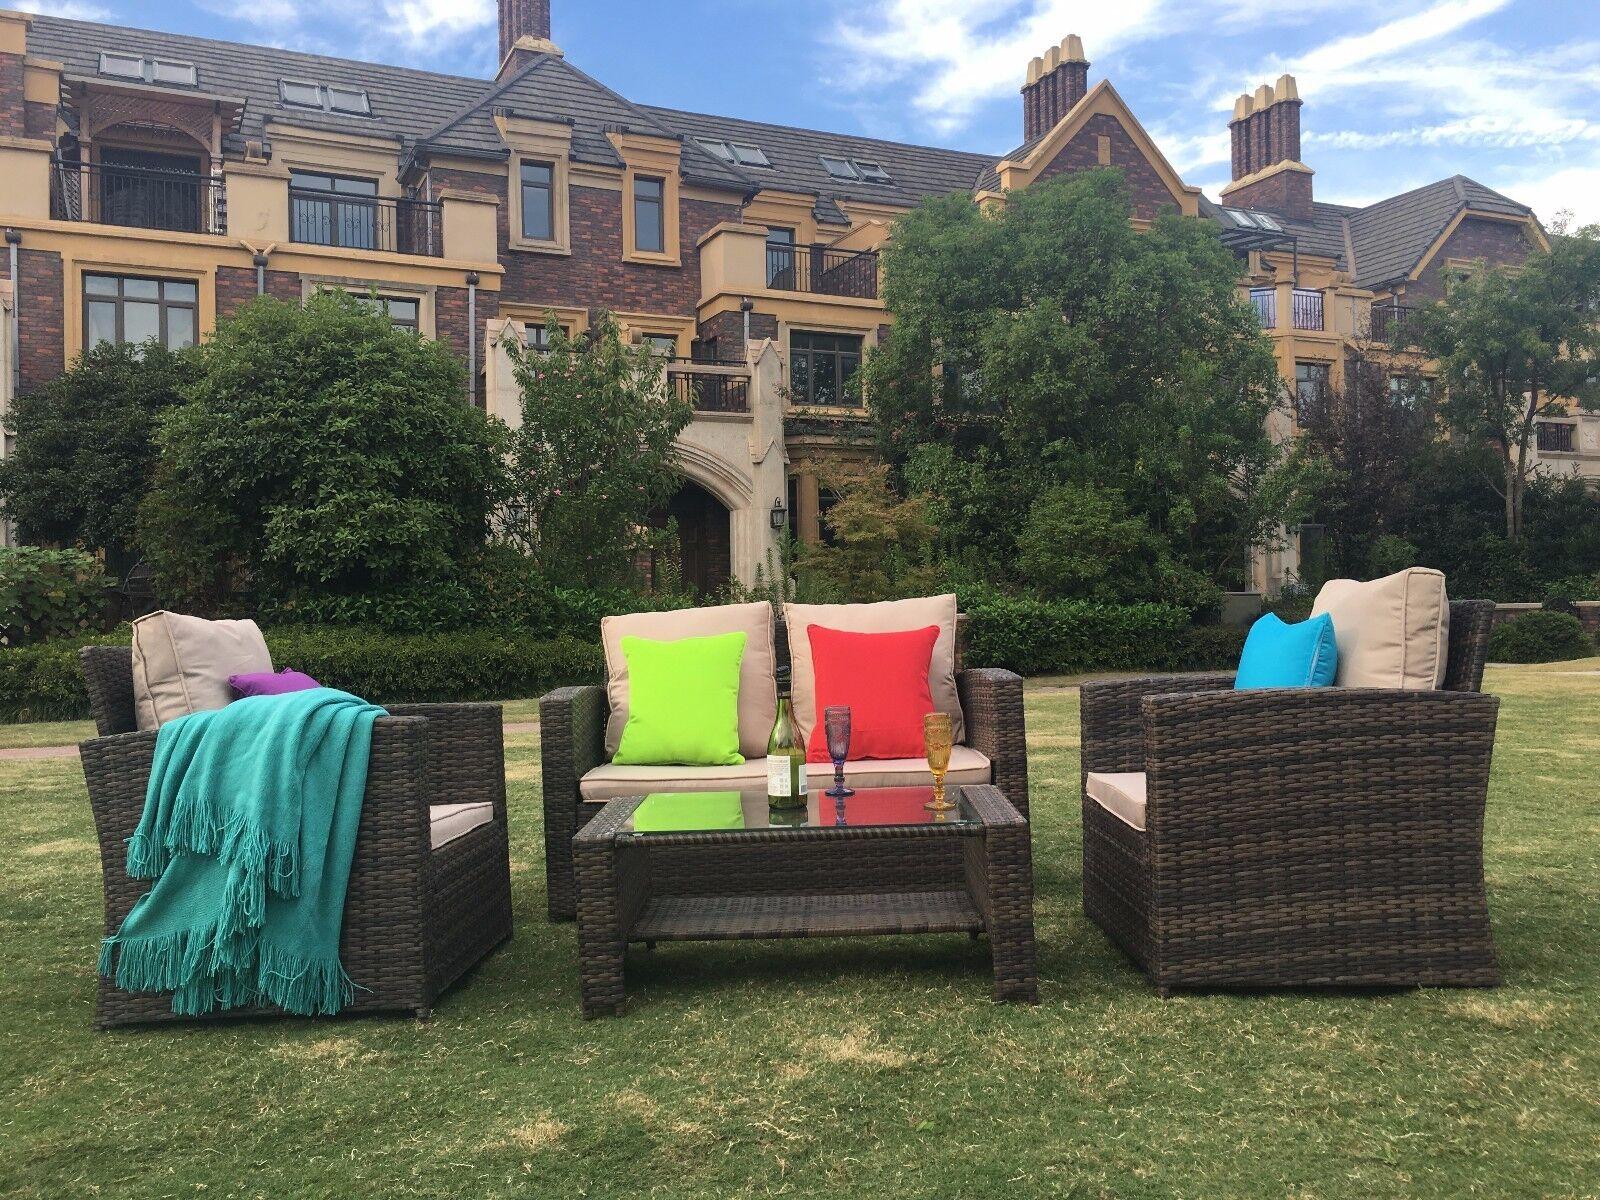 Garden Furniture - Conservatory 4 Piece Rattan Sofa Garden Furniture Patio Set Table Chair Brown